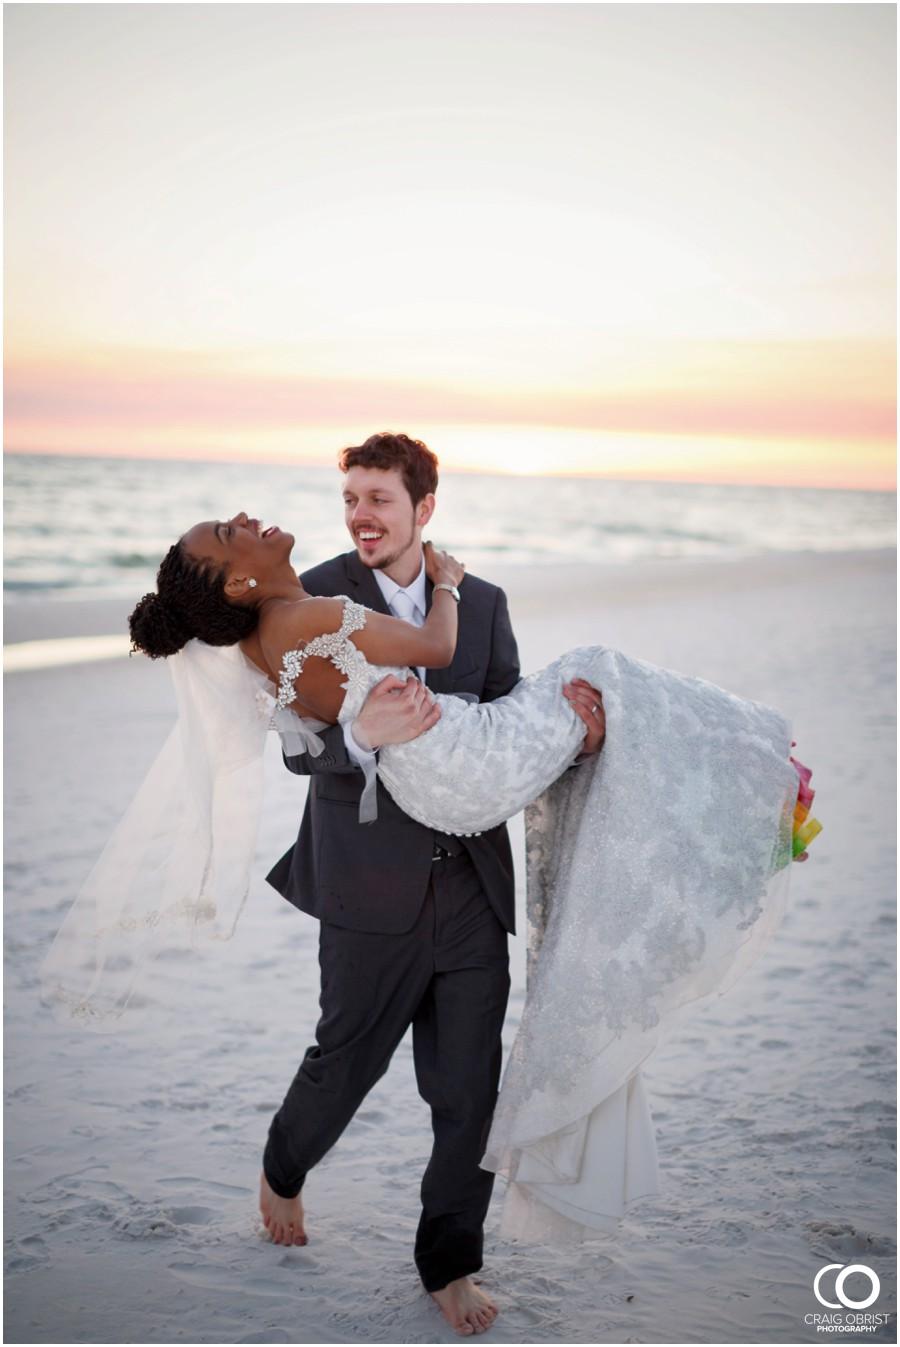 Seaside-30A-Beachside-Wedding-Sunset-Santa-Rosa-Photographer_0095.jpg